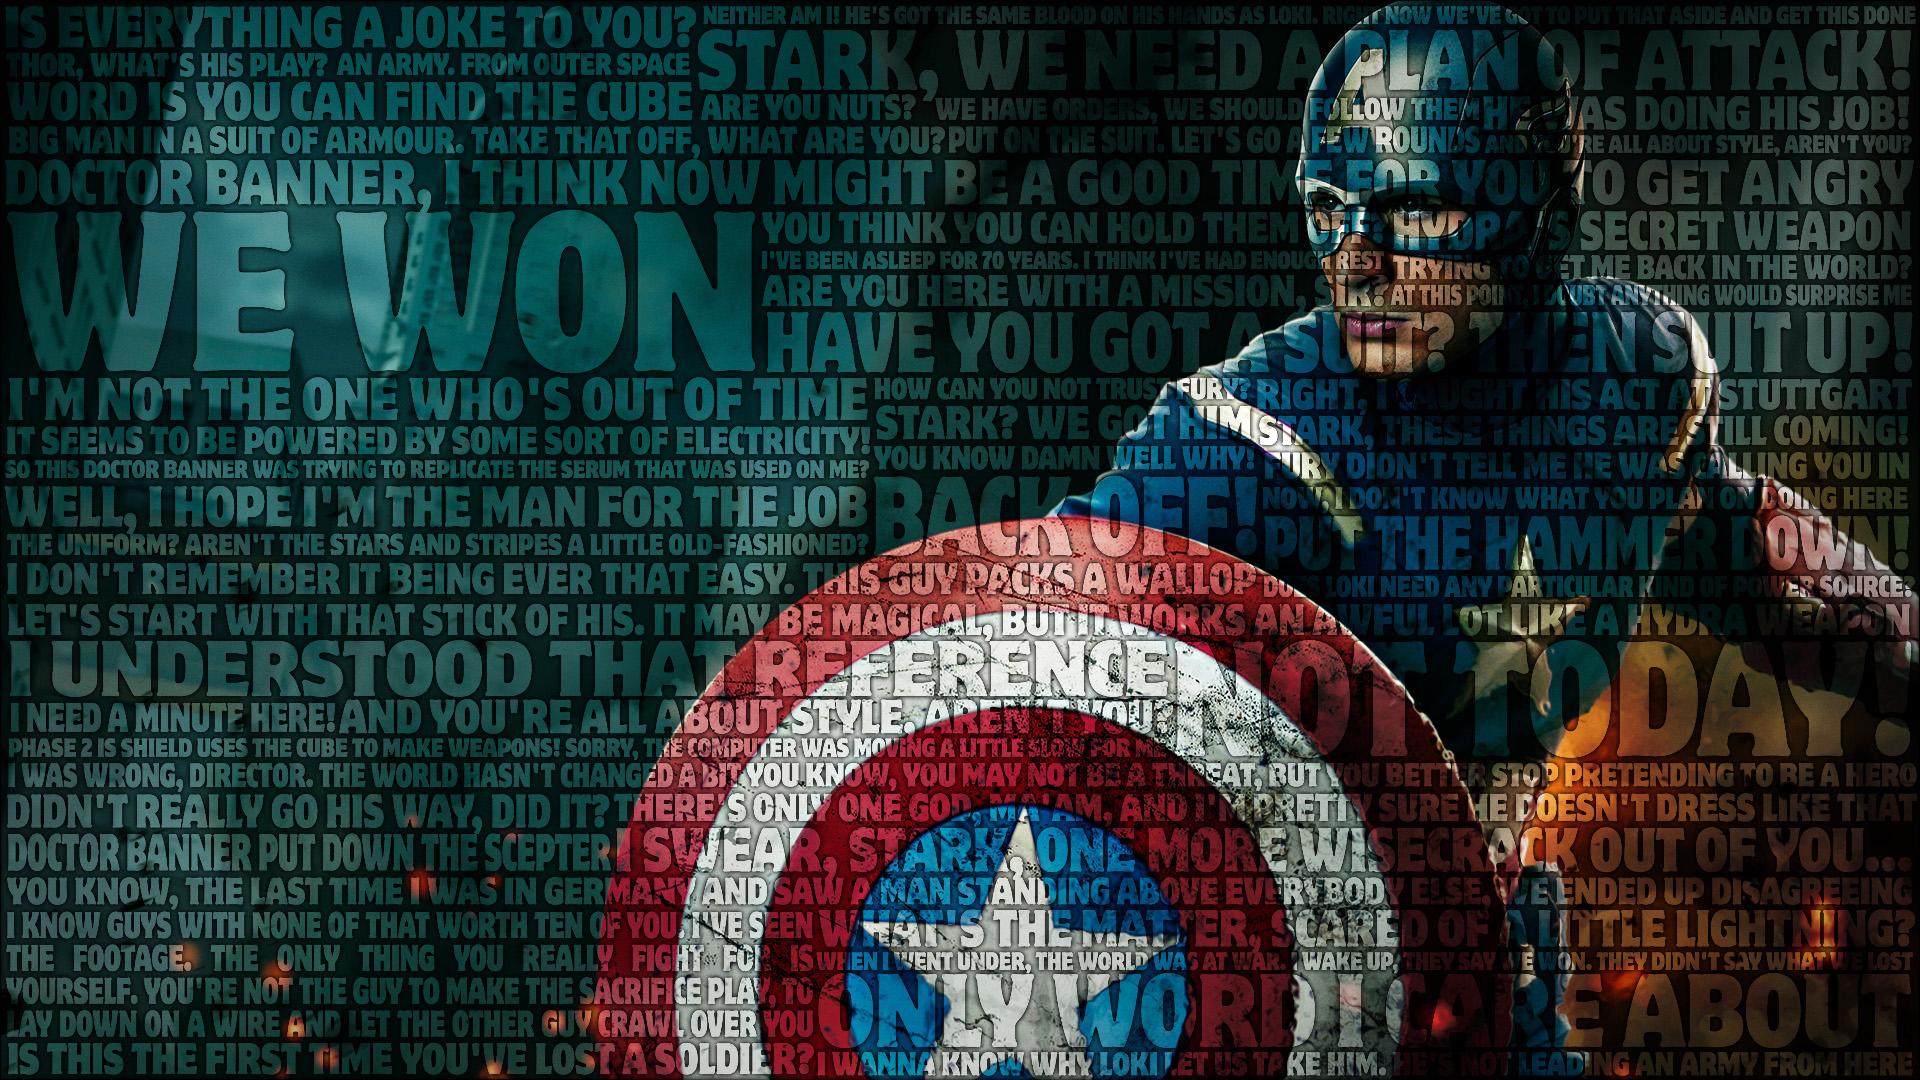 Captain America Avengers Typography wallpaper background 1920x1080